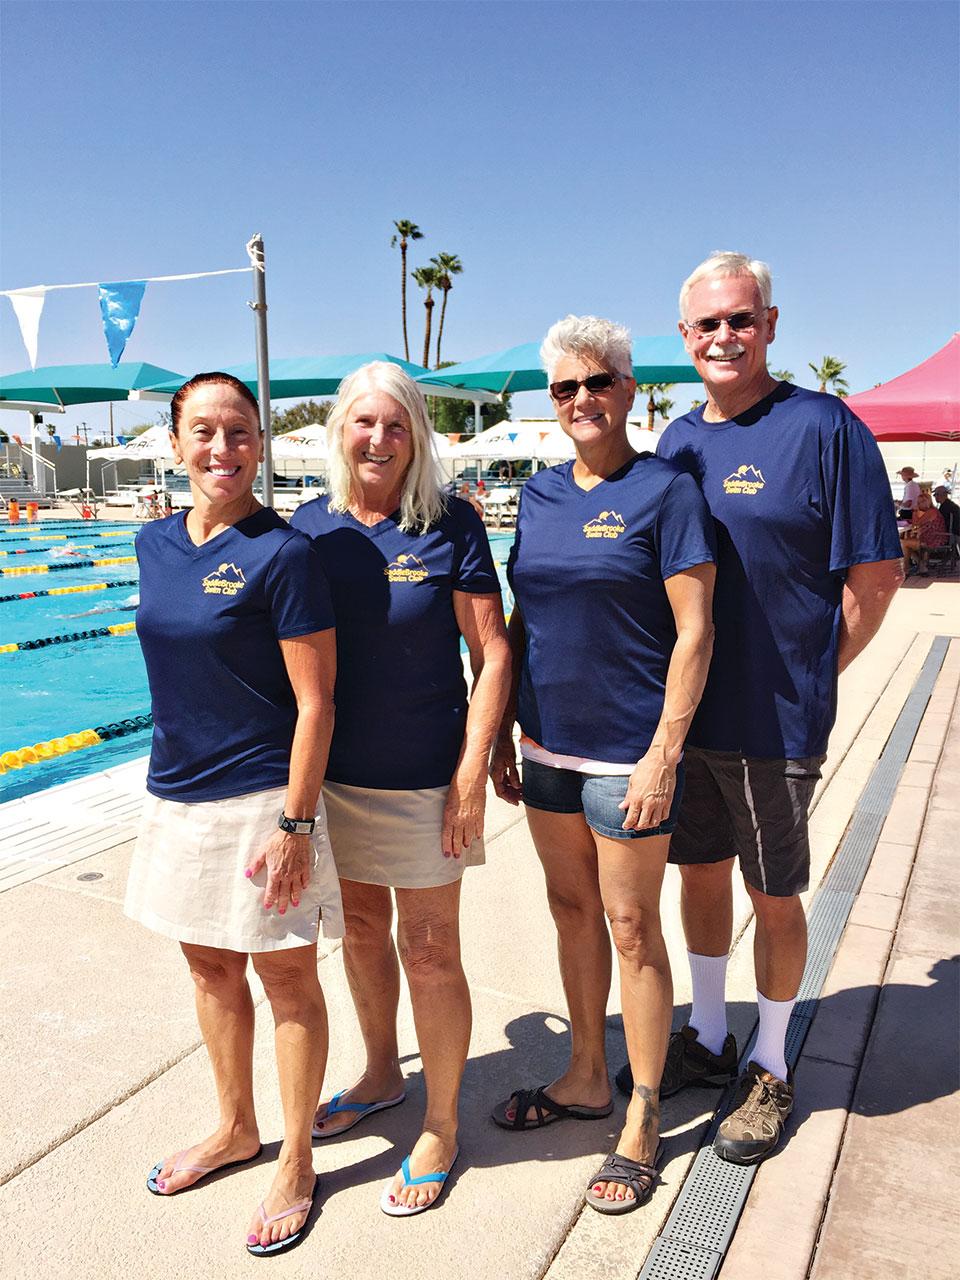 Lyn Moreno, Allison Lehman, Samantha Martoni and Craig Schaffer participated in the third annual Jamina Winston swim meet.